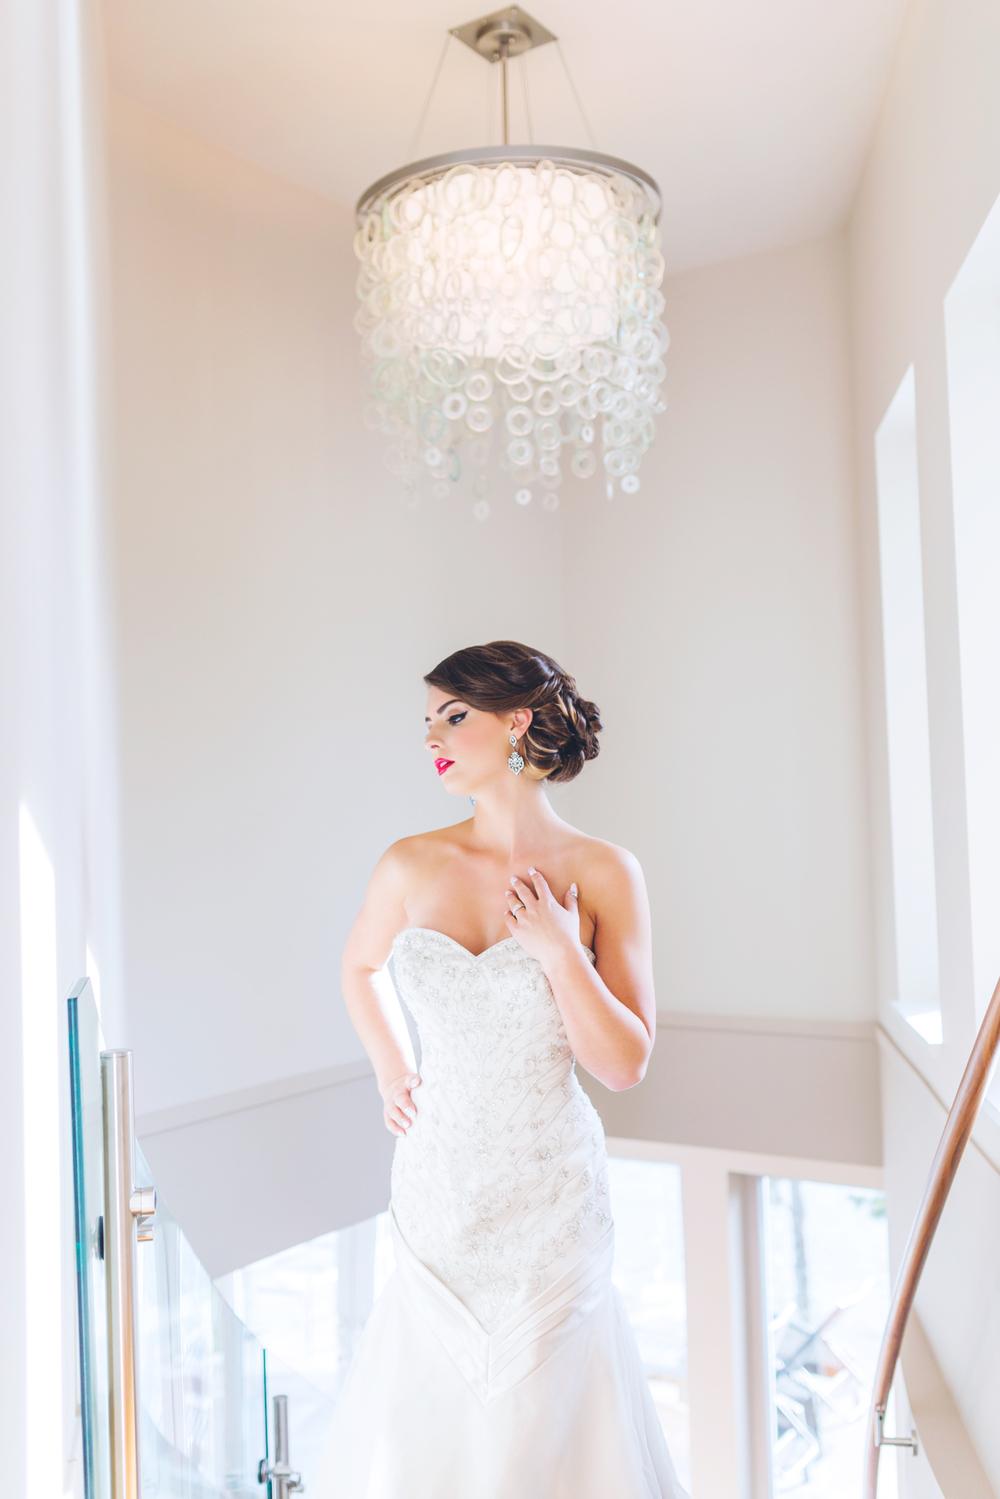 IMG_6477-BRIDAL-EDITORIAL-JENNIFER-PICARD-PHOTOGRAPHY-FINE-ART-WEDDINGS.jpg